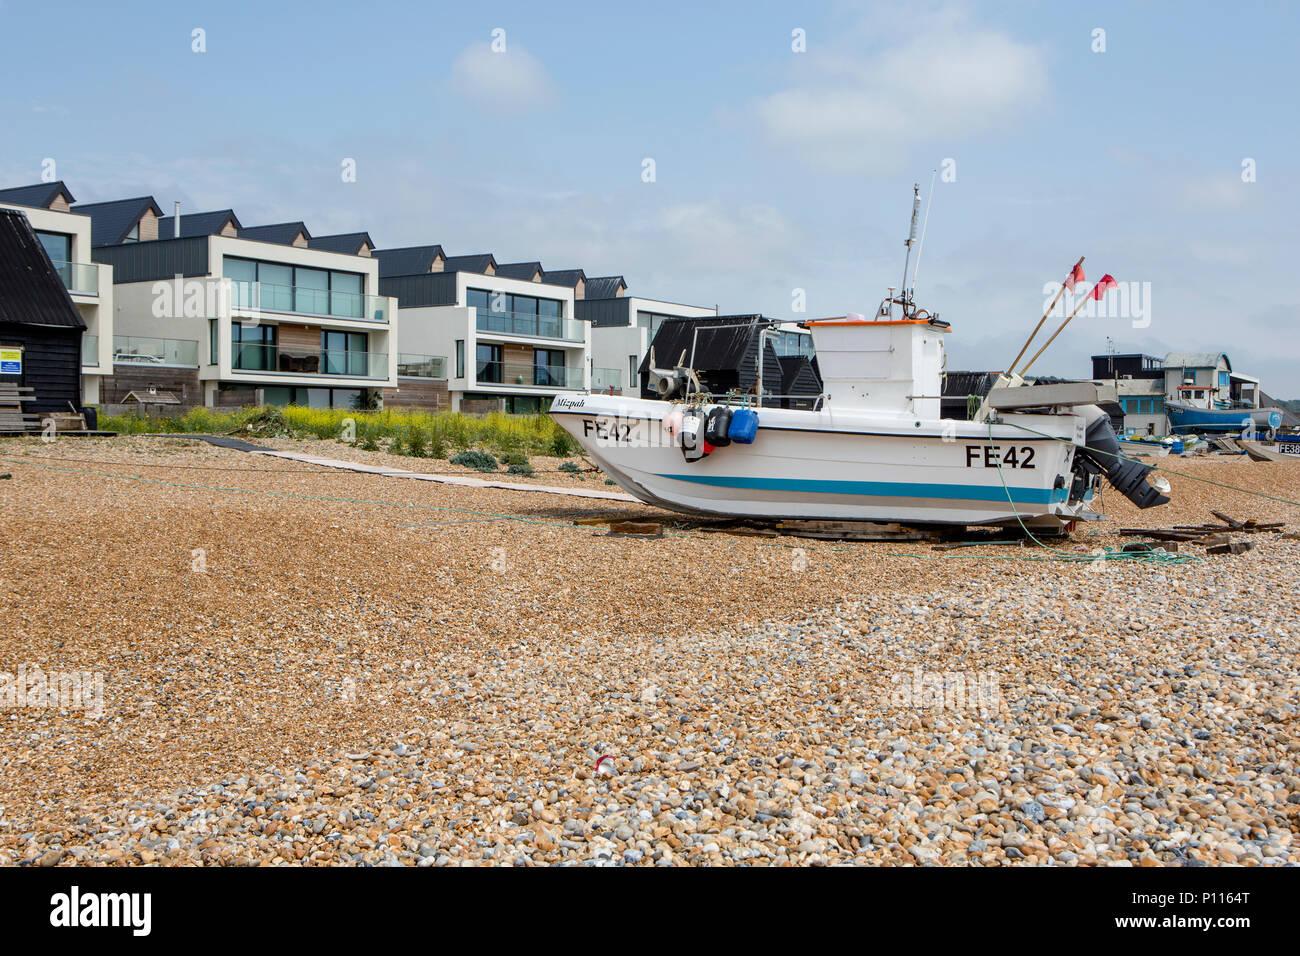 New building development on Fisherman's beach, Hythe, Kent, UK - Stock Image